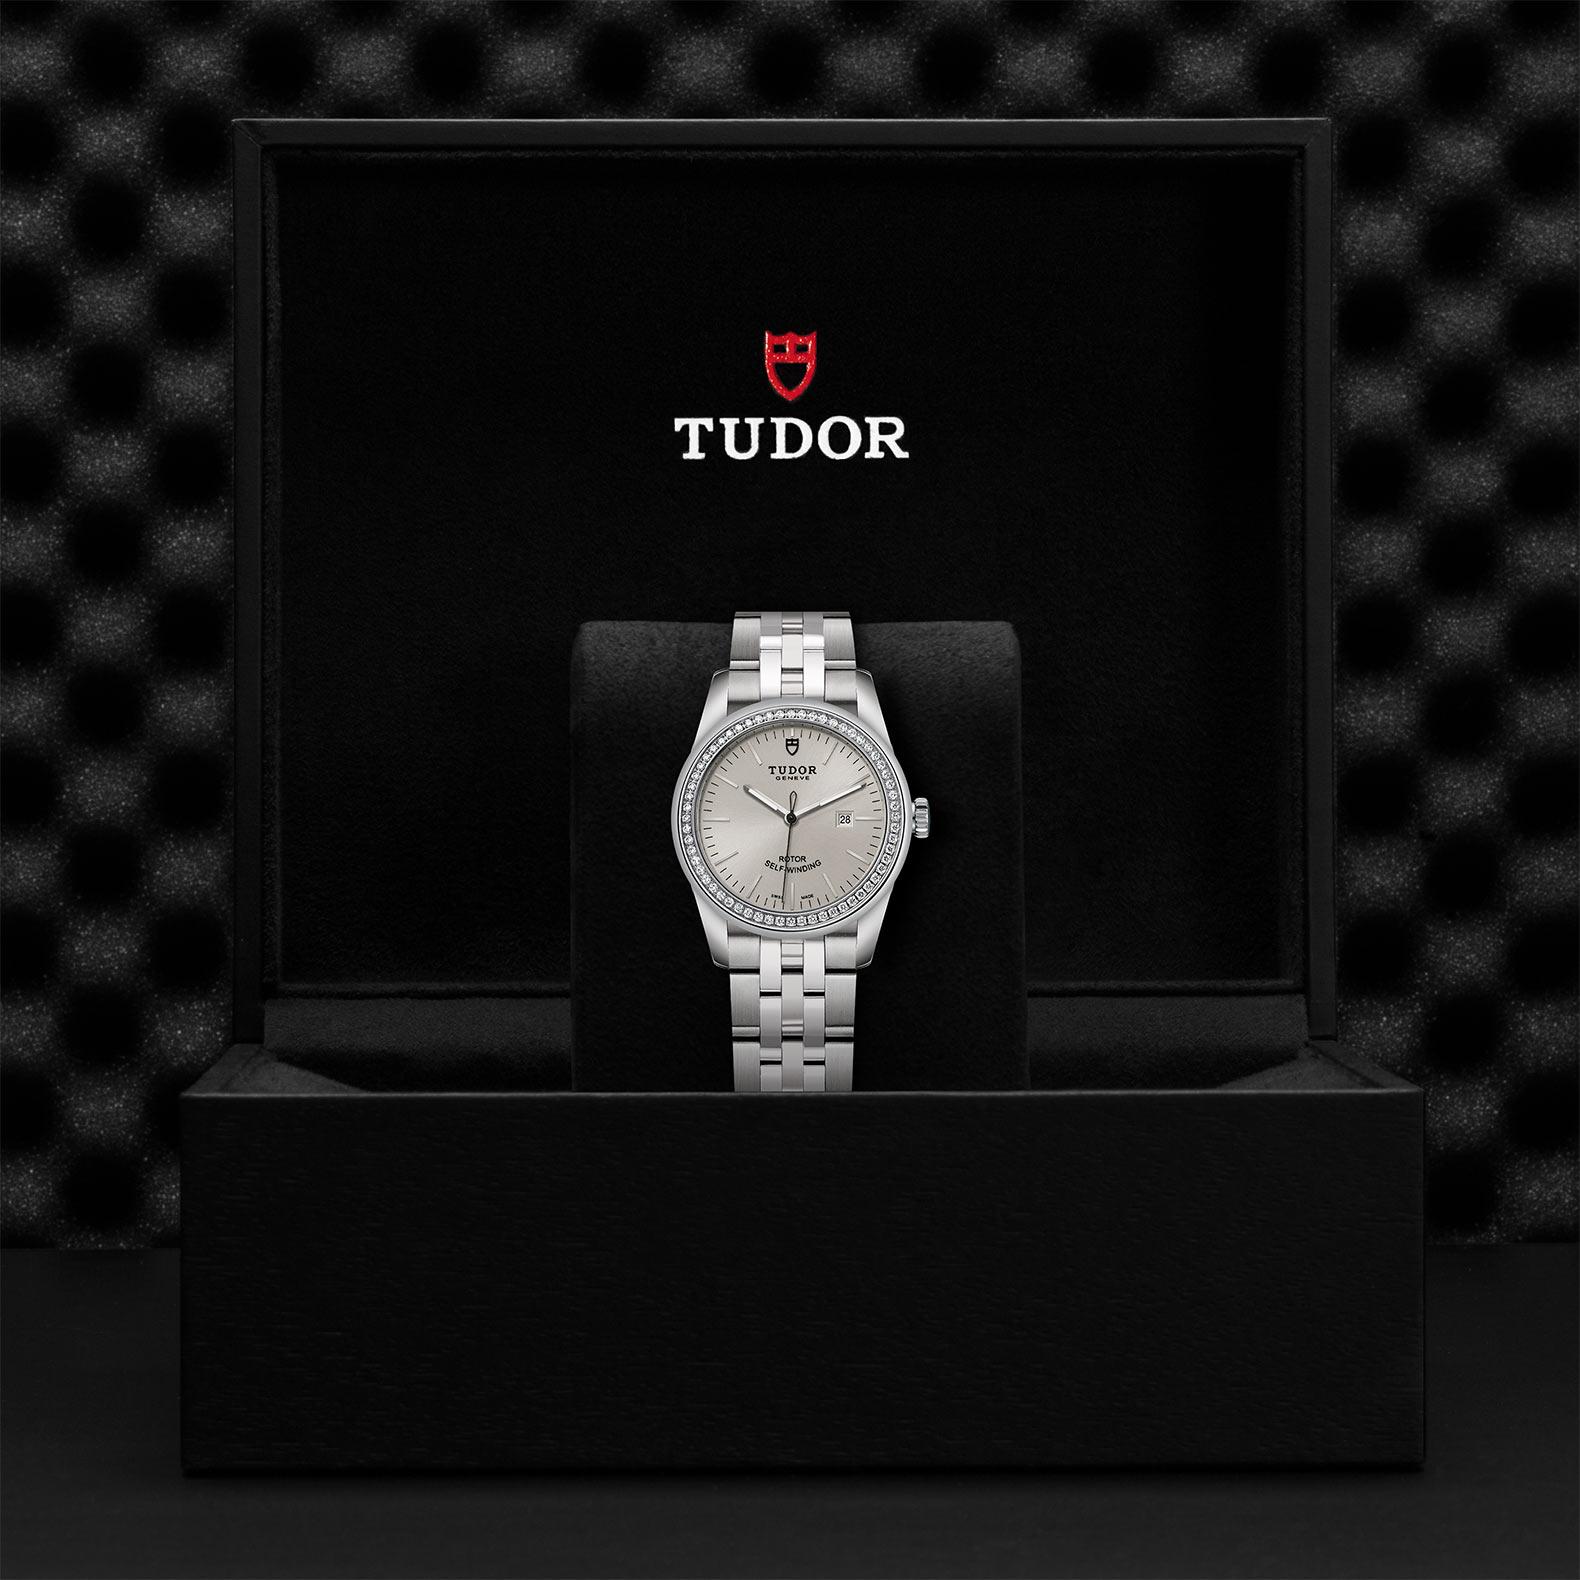 TUDOR Glamour Date - M53020-0004